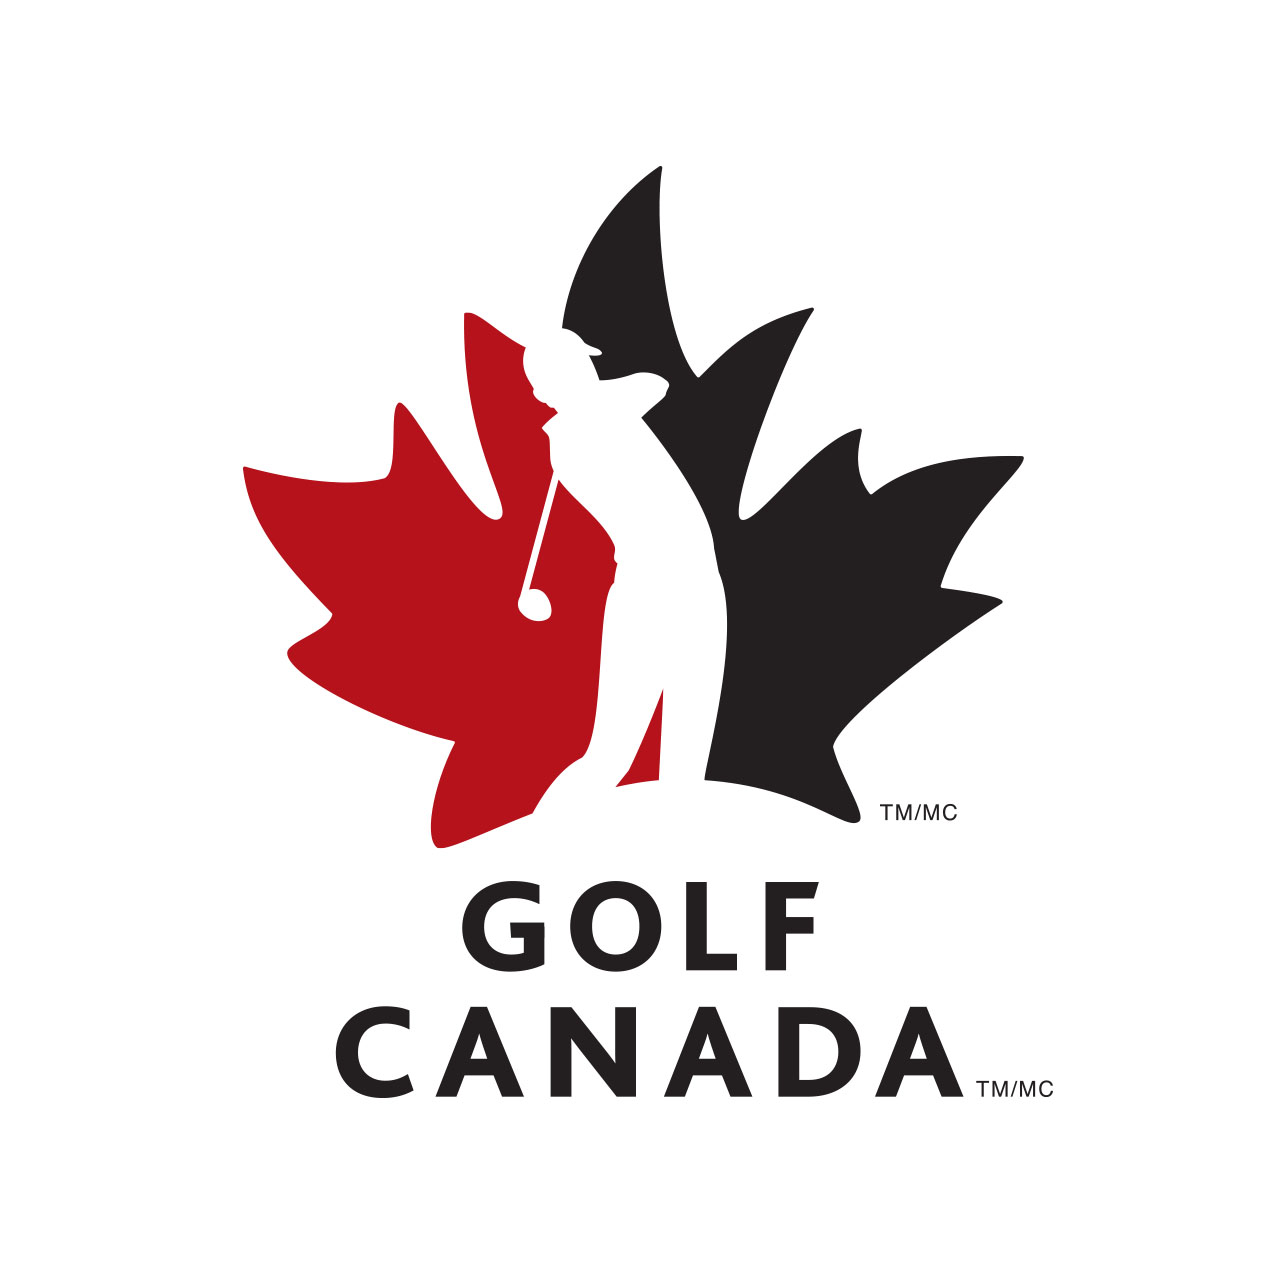 Go to website of Golf Canada